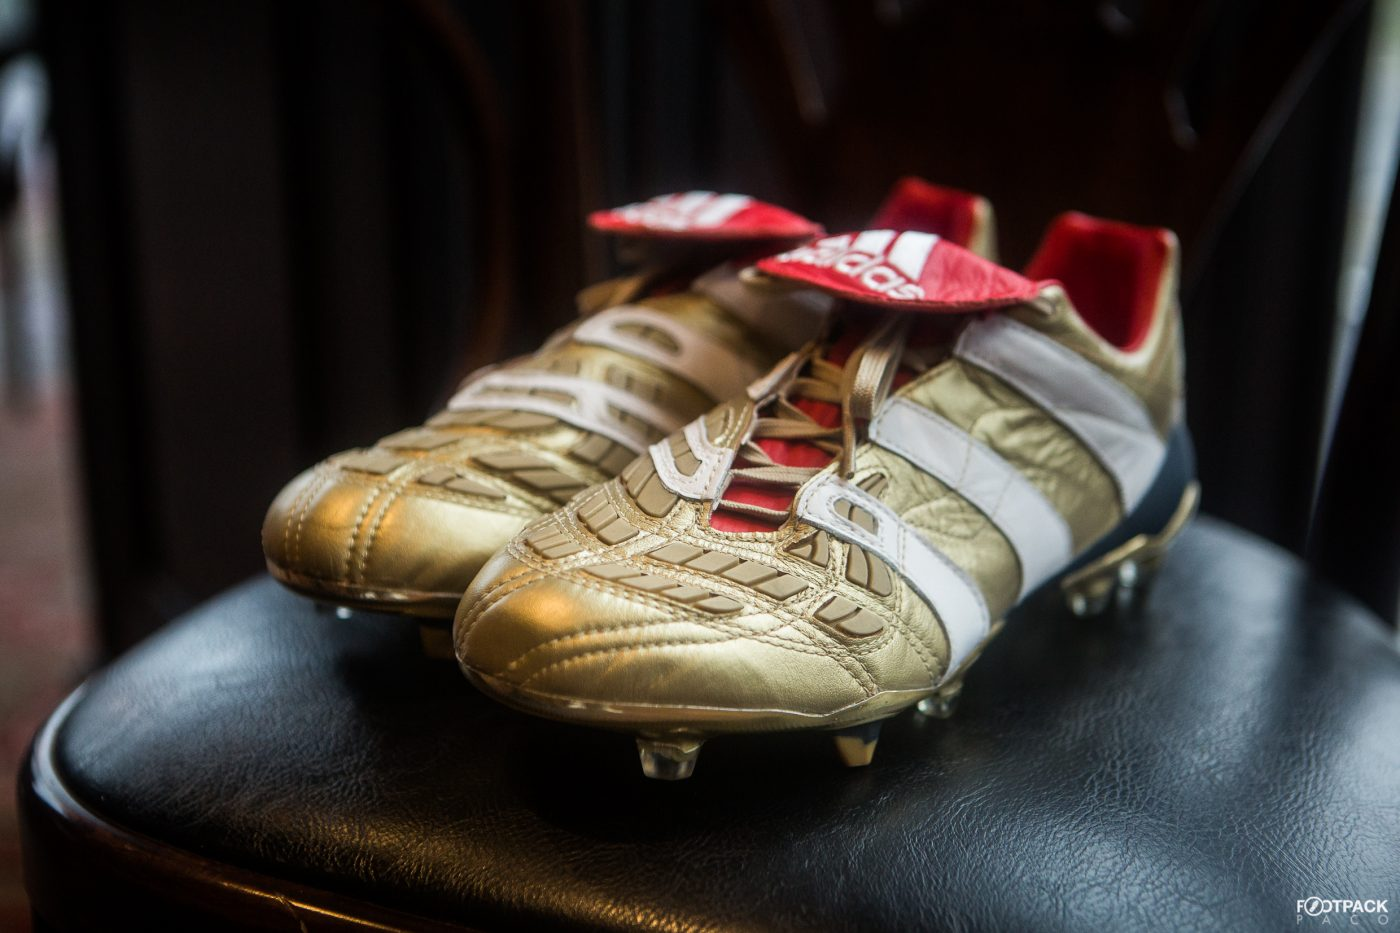 adidas-predator-accelerator-zinedine-zidane-collection-limitee-25-ans-predator-footpack-10